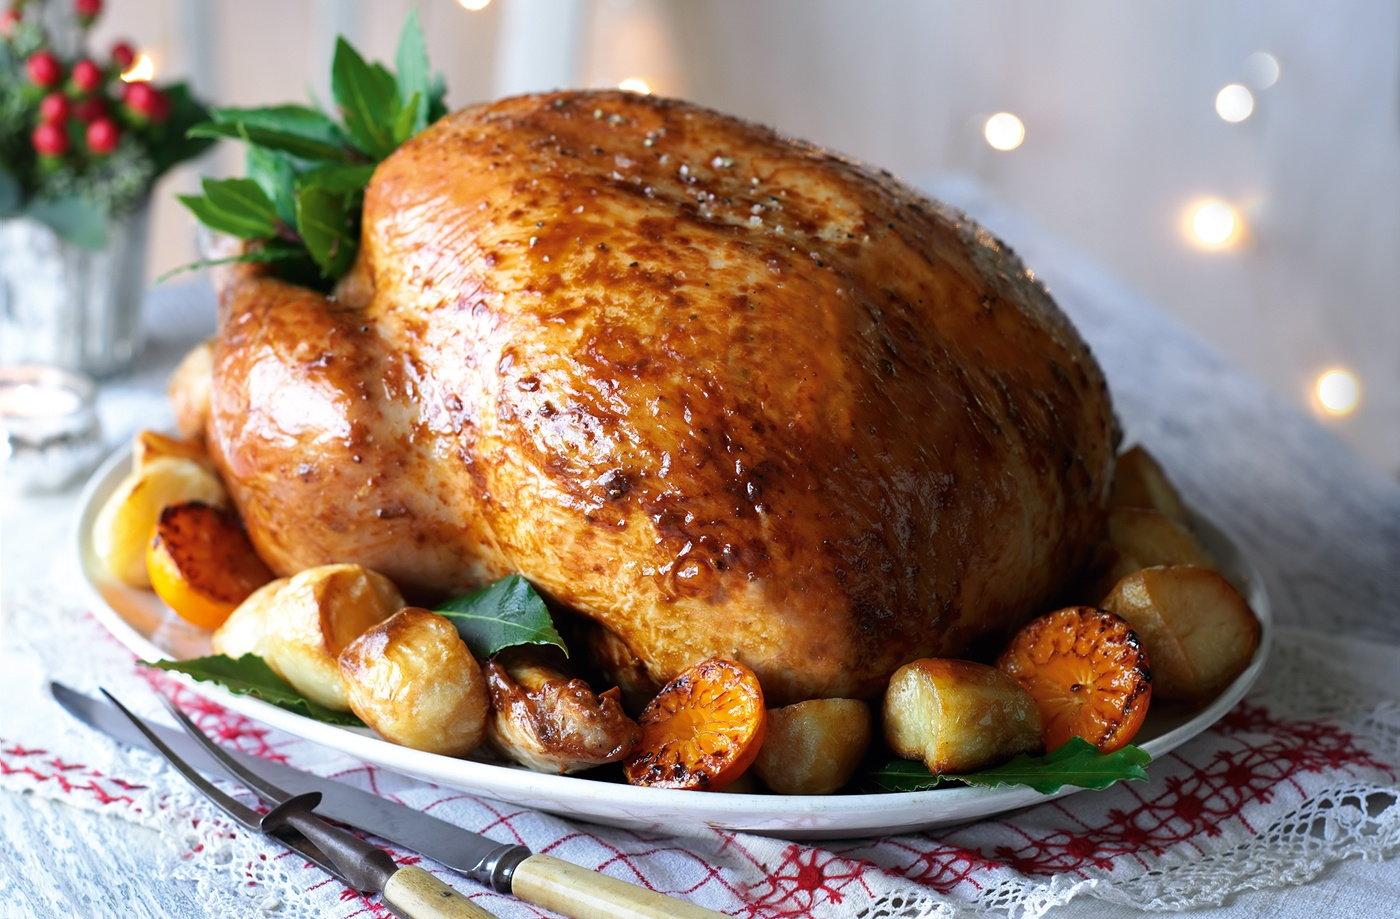 Watch Roast Chicken with Asparagus video